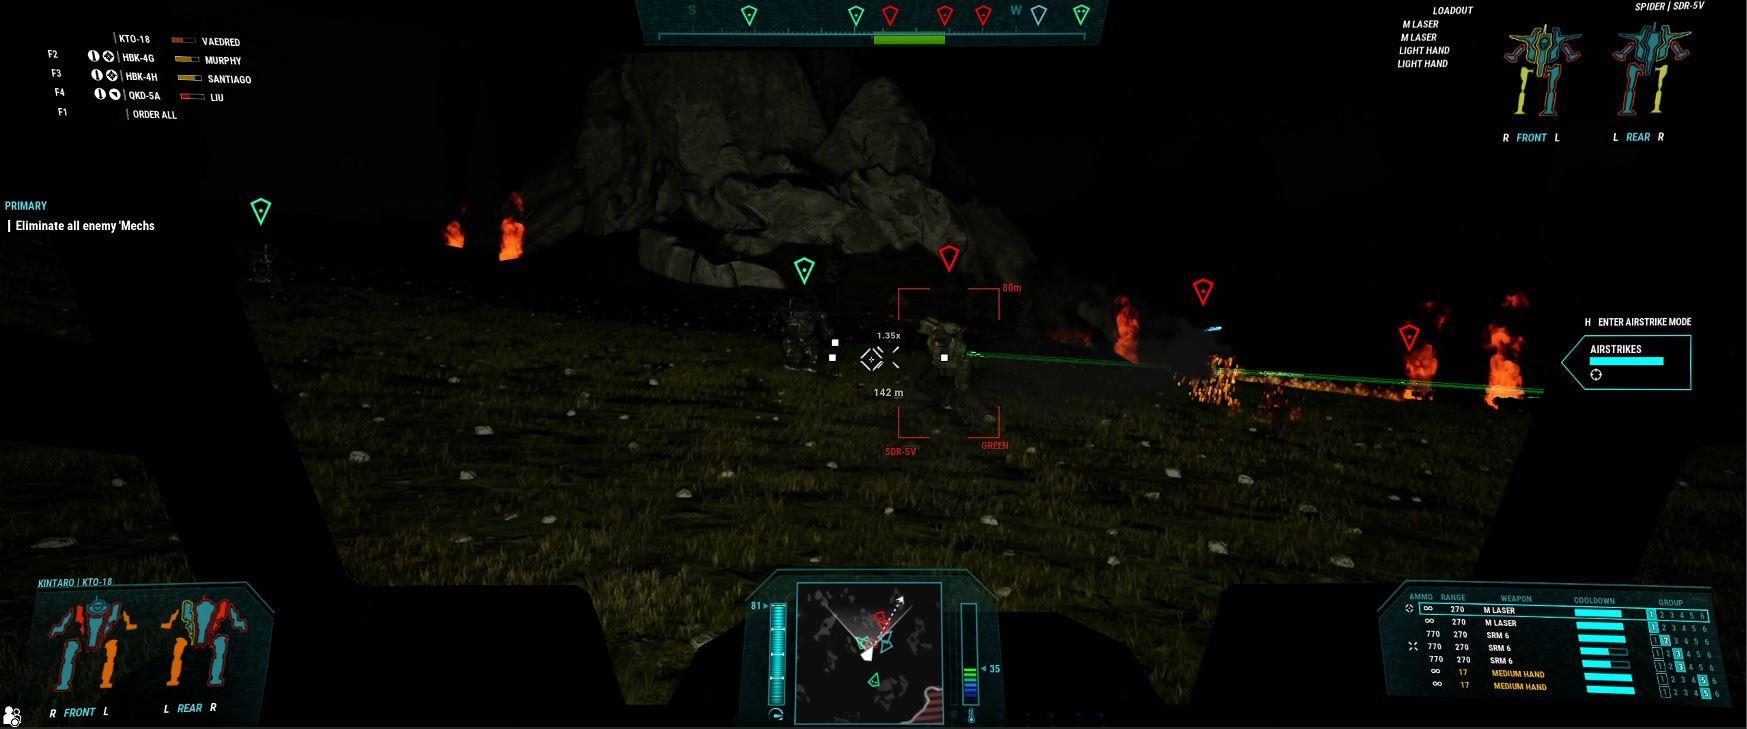 MechWarrior 5: Mercenaries List of Mods in Game + Links Download - [Cosmetic Mods 2] - DF1121F